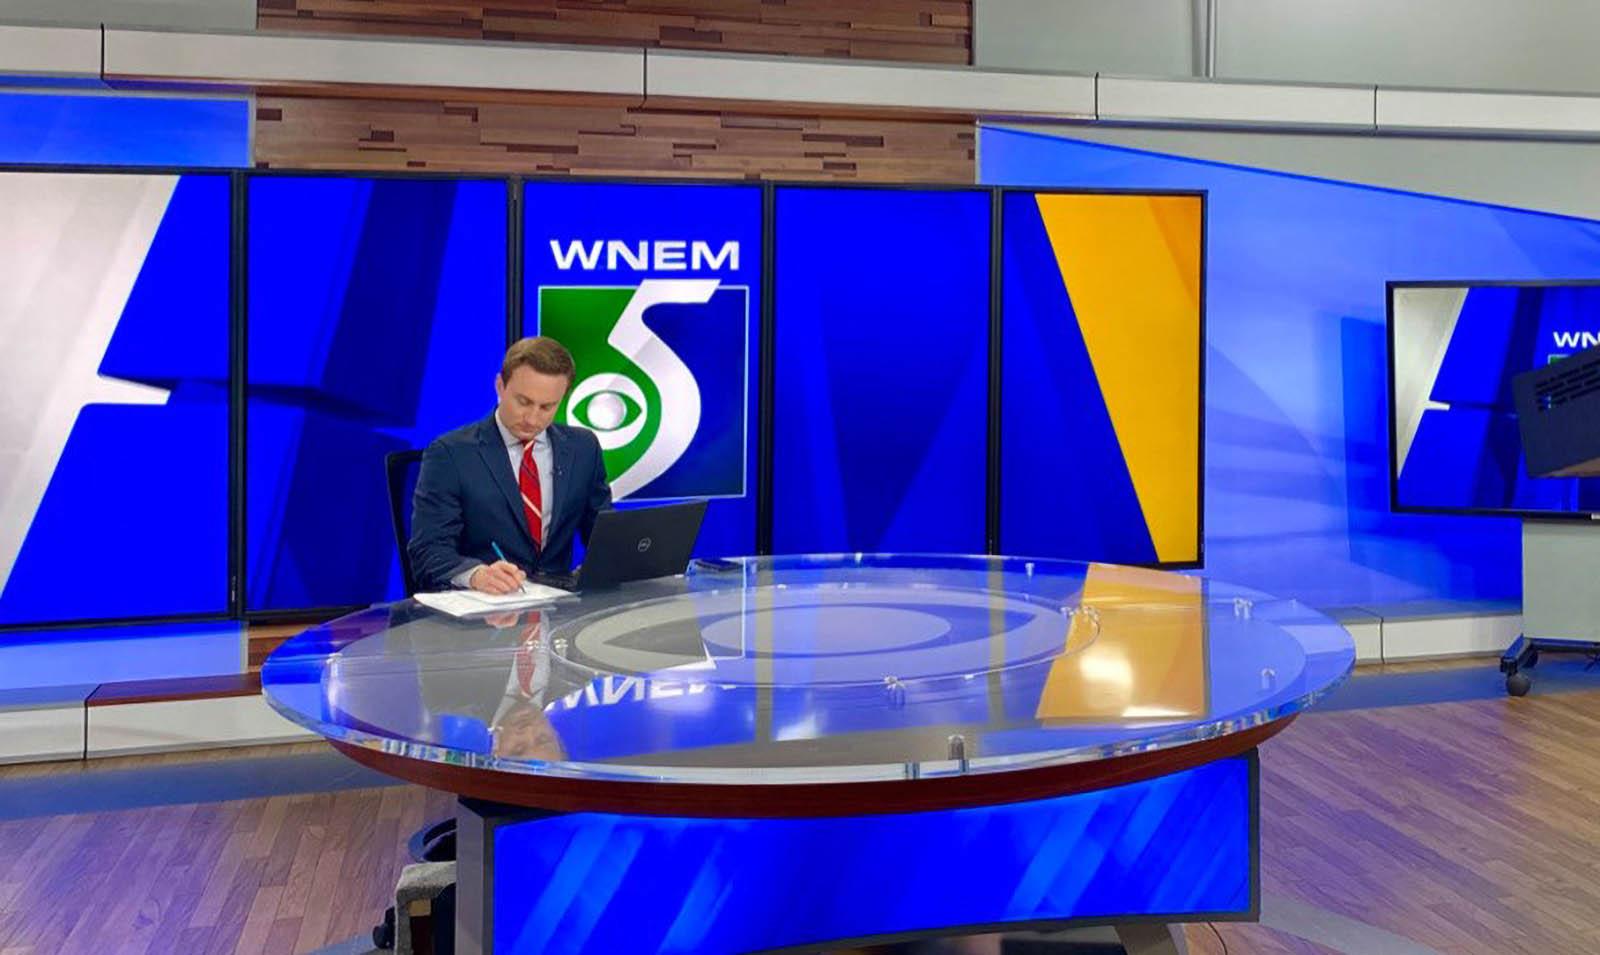 Trevor Sochocki covering news for WNEM TV5